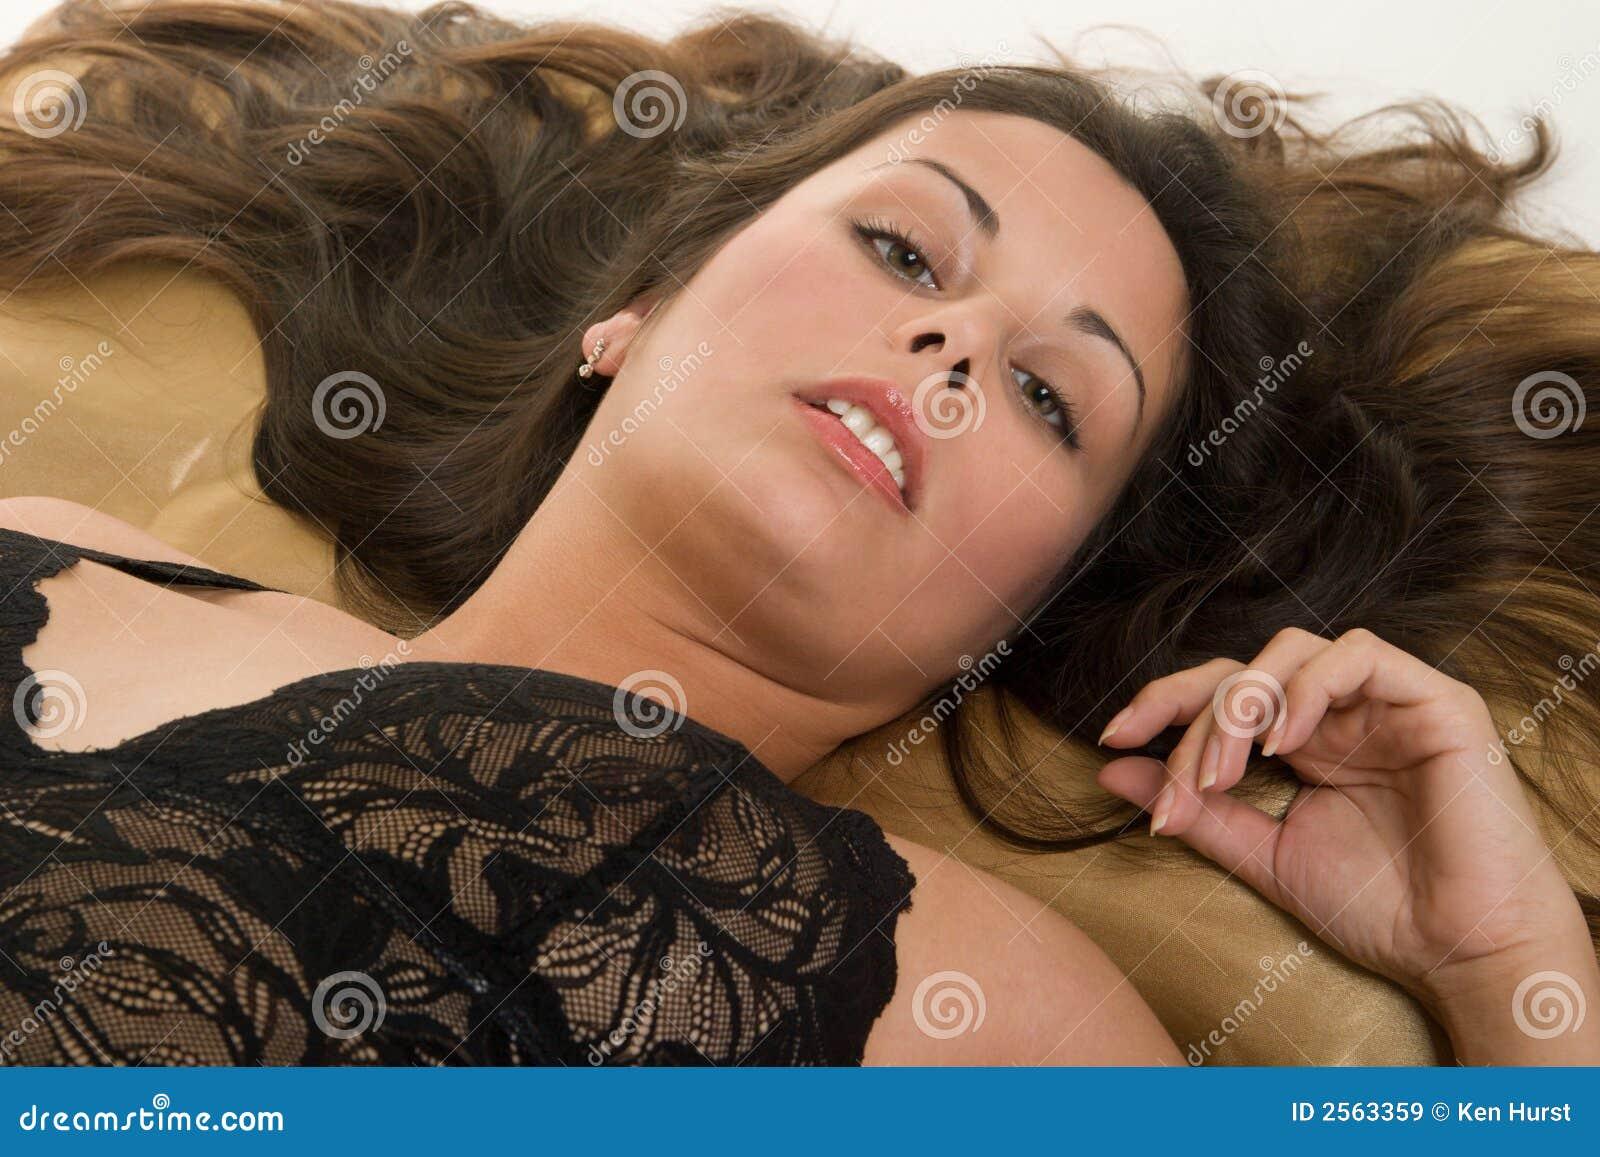 naked girls lying down